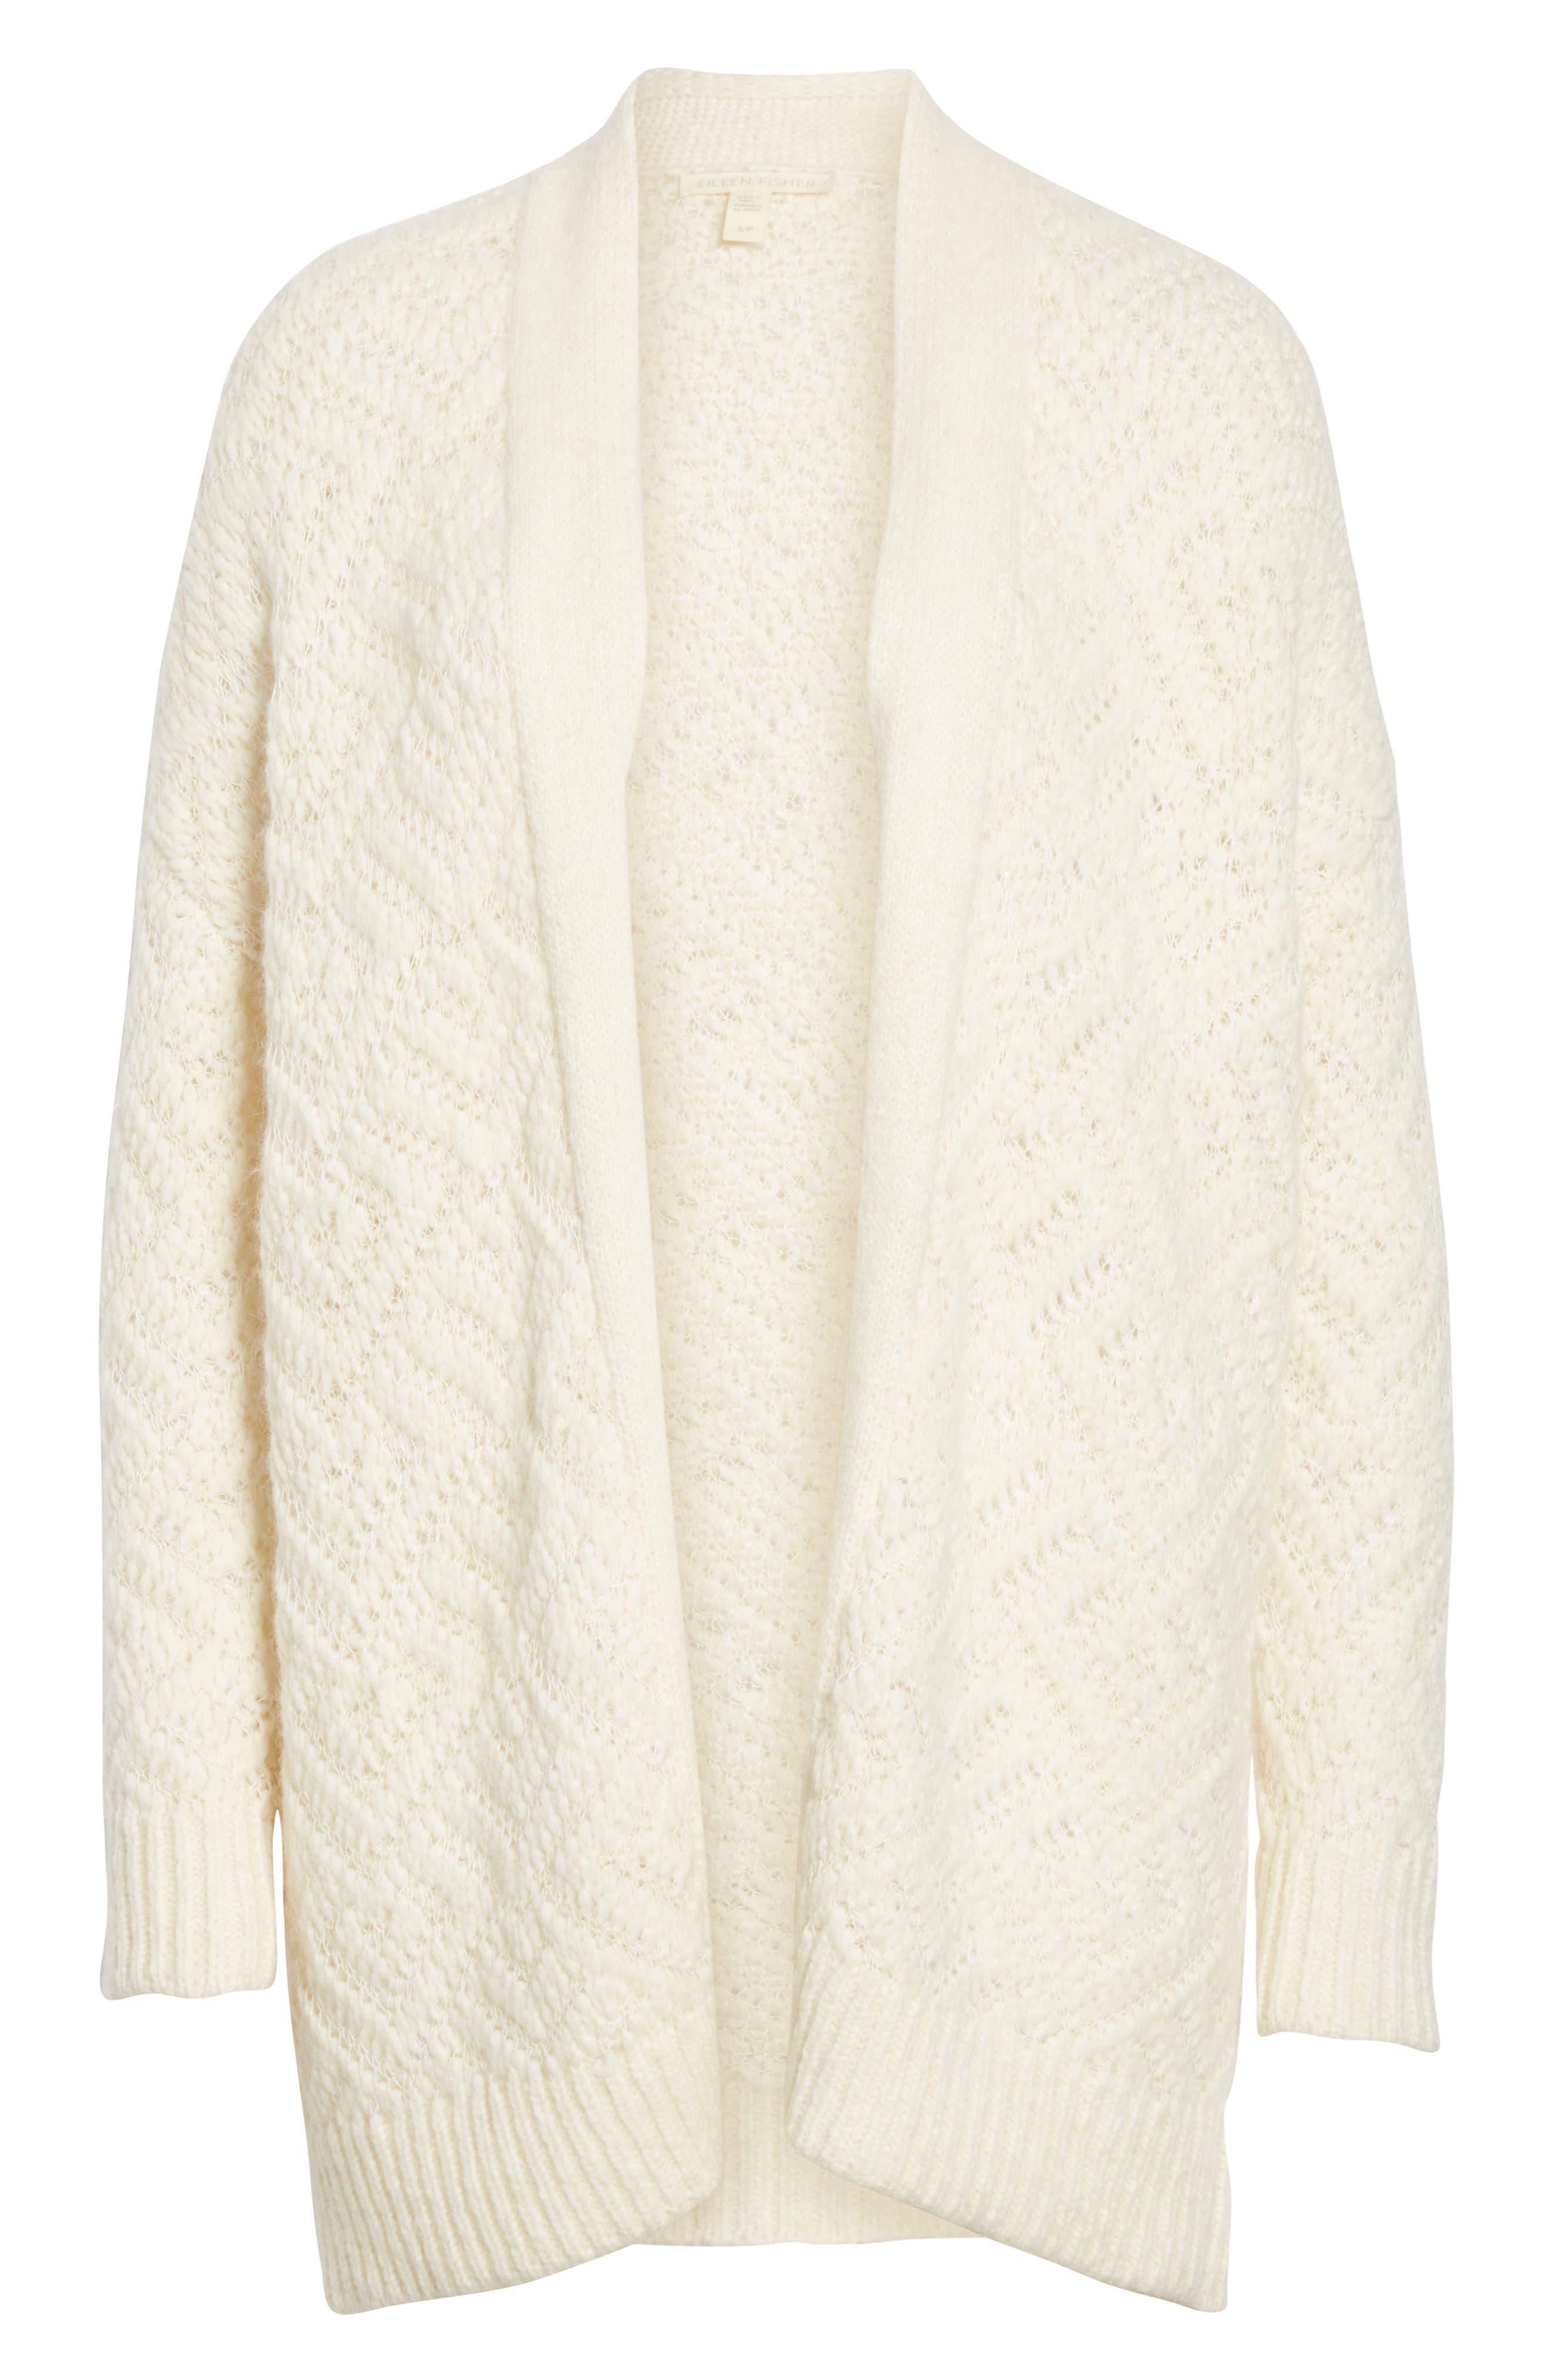 Simple Cardigan,                             Alternate thumbnail 6, color,                             SOFT WHITE